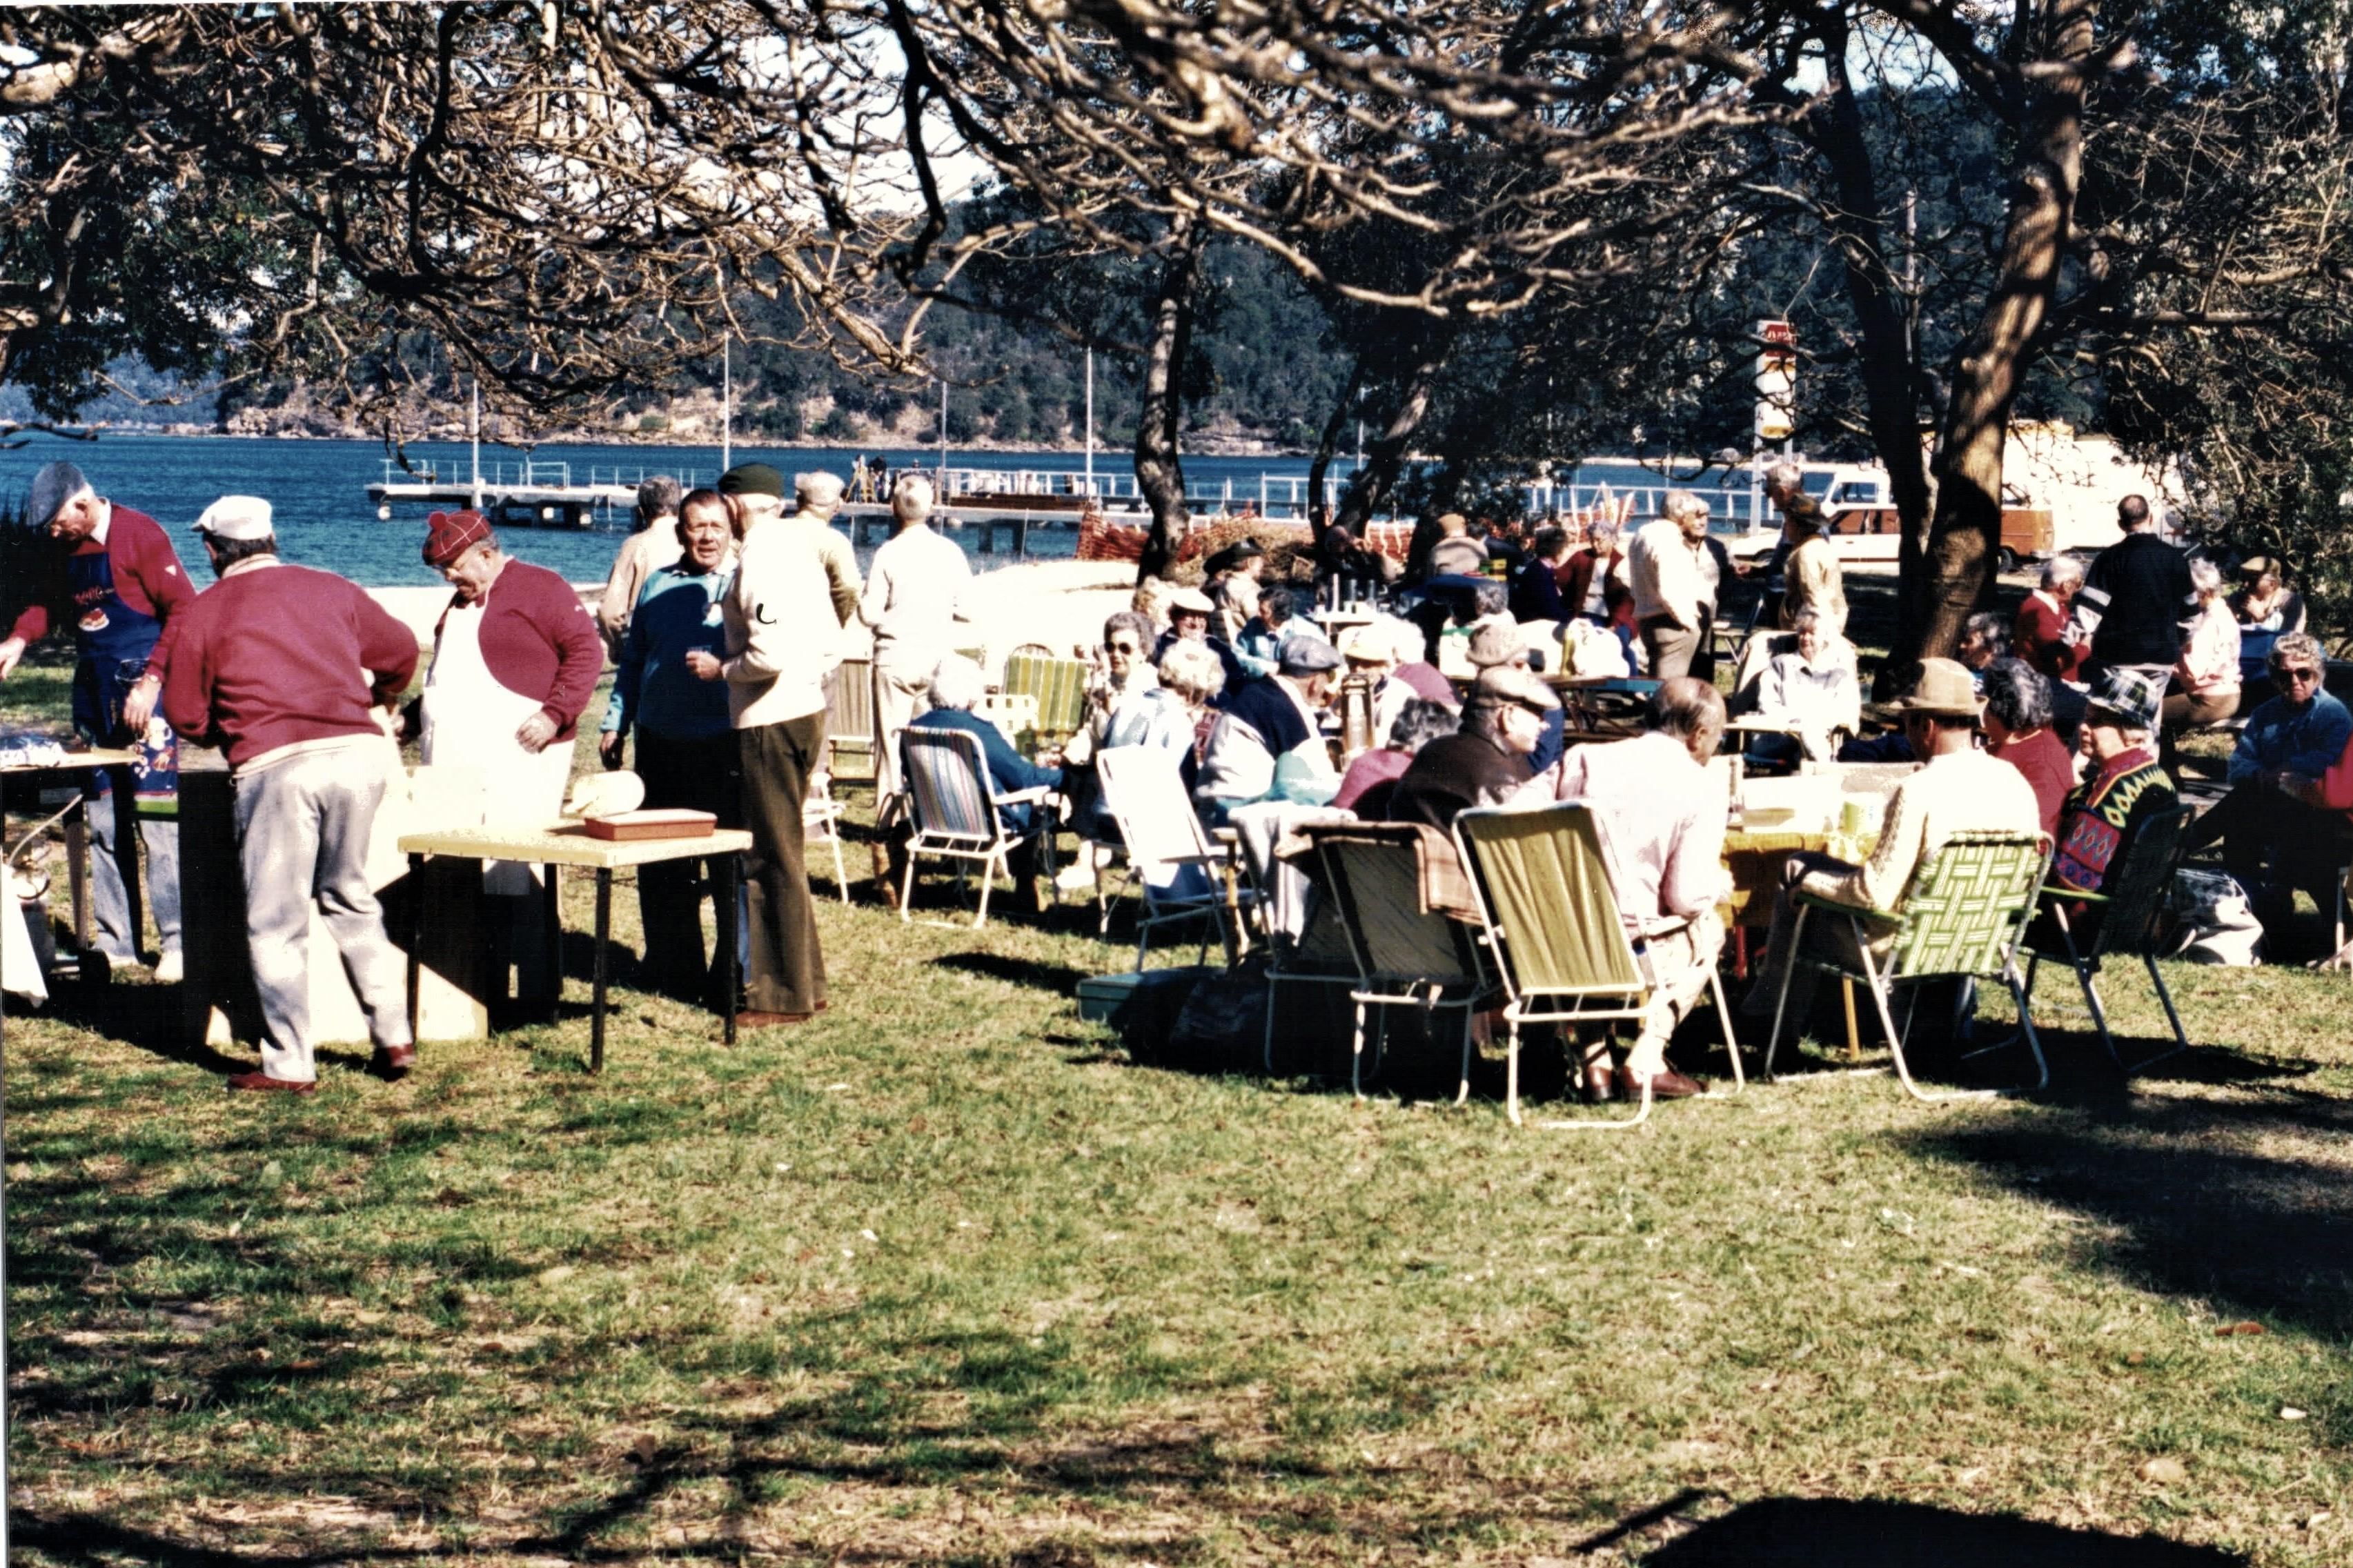 1989 Outings Barbecue at Patonga 11-7-89